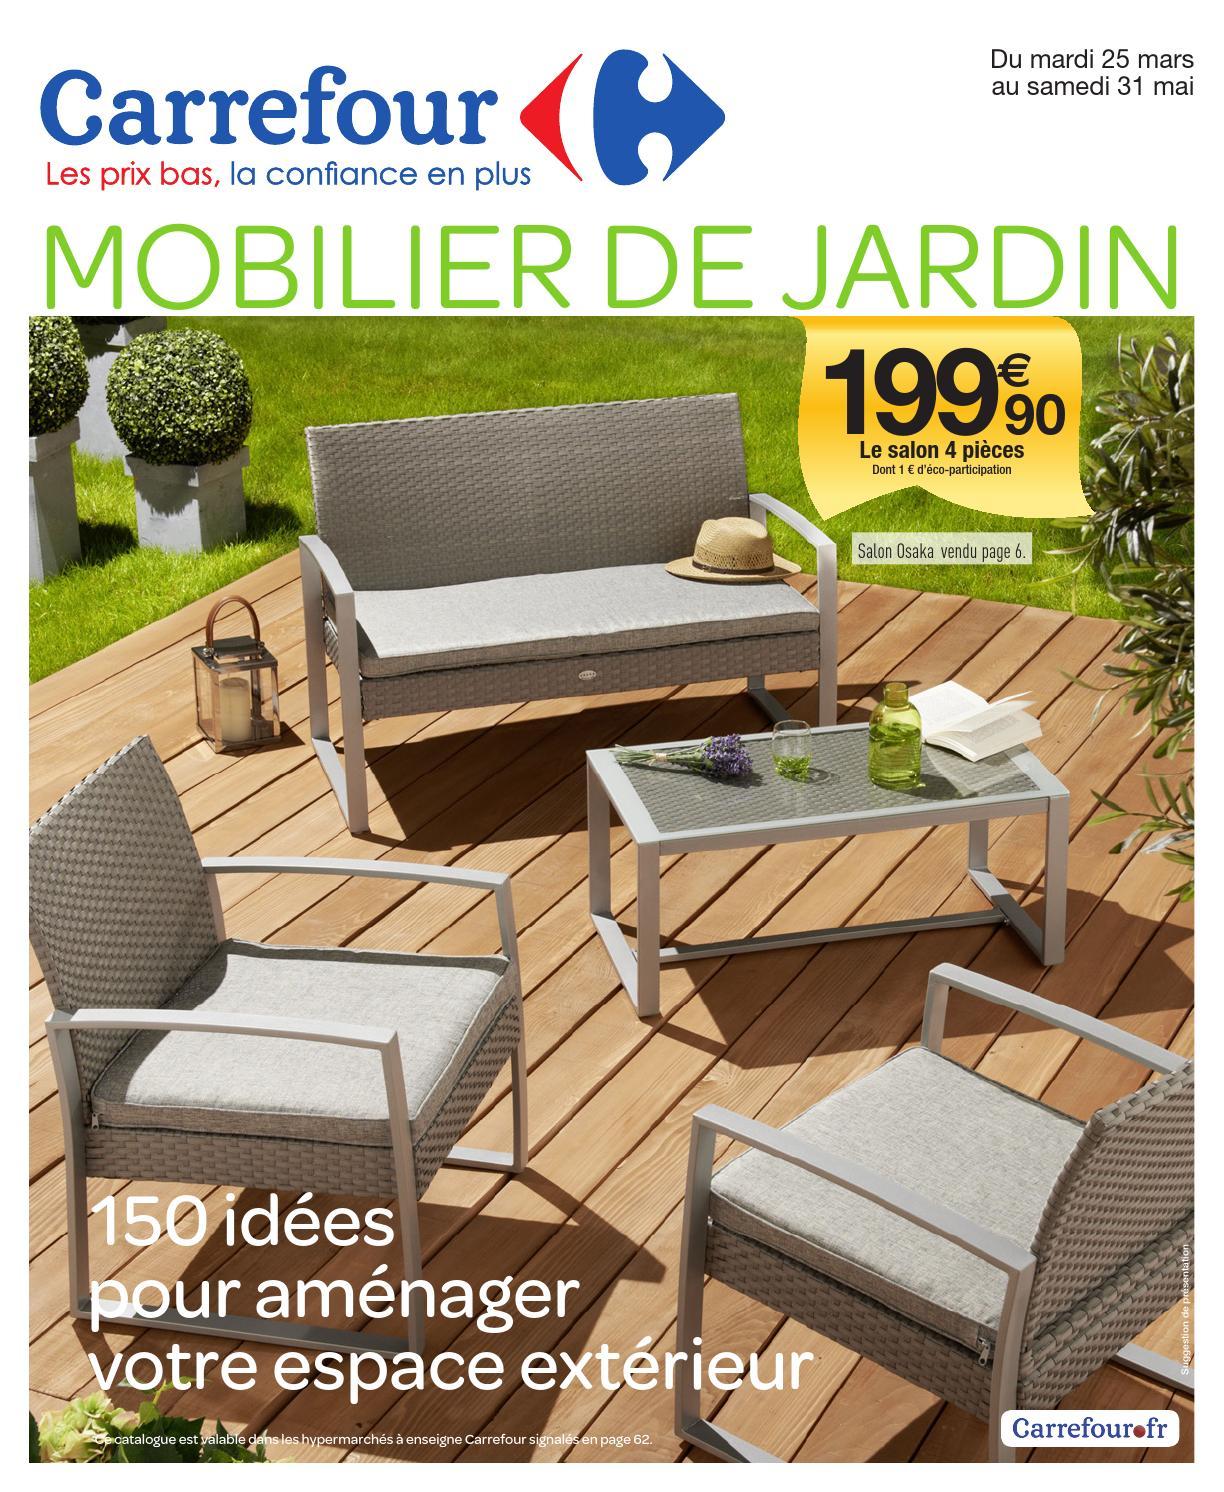 Catalogue Carrefour - 25.03-31.05.2014 By Joe Monroe - Issuu avec Salon De Jardin En Soldes